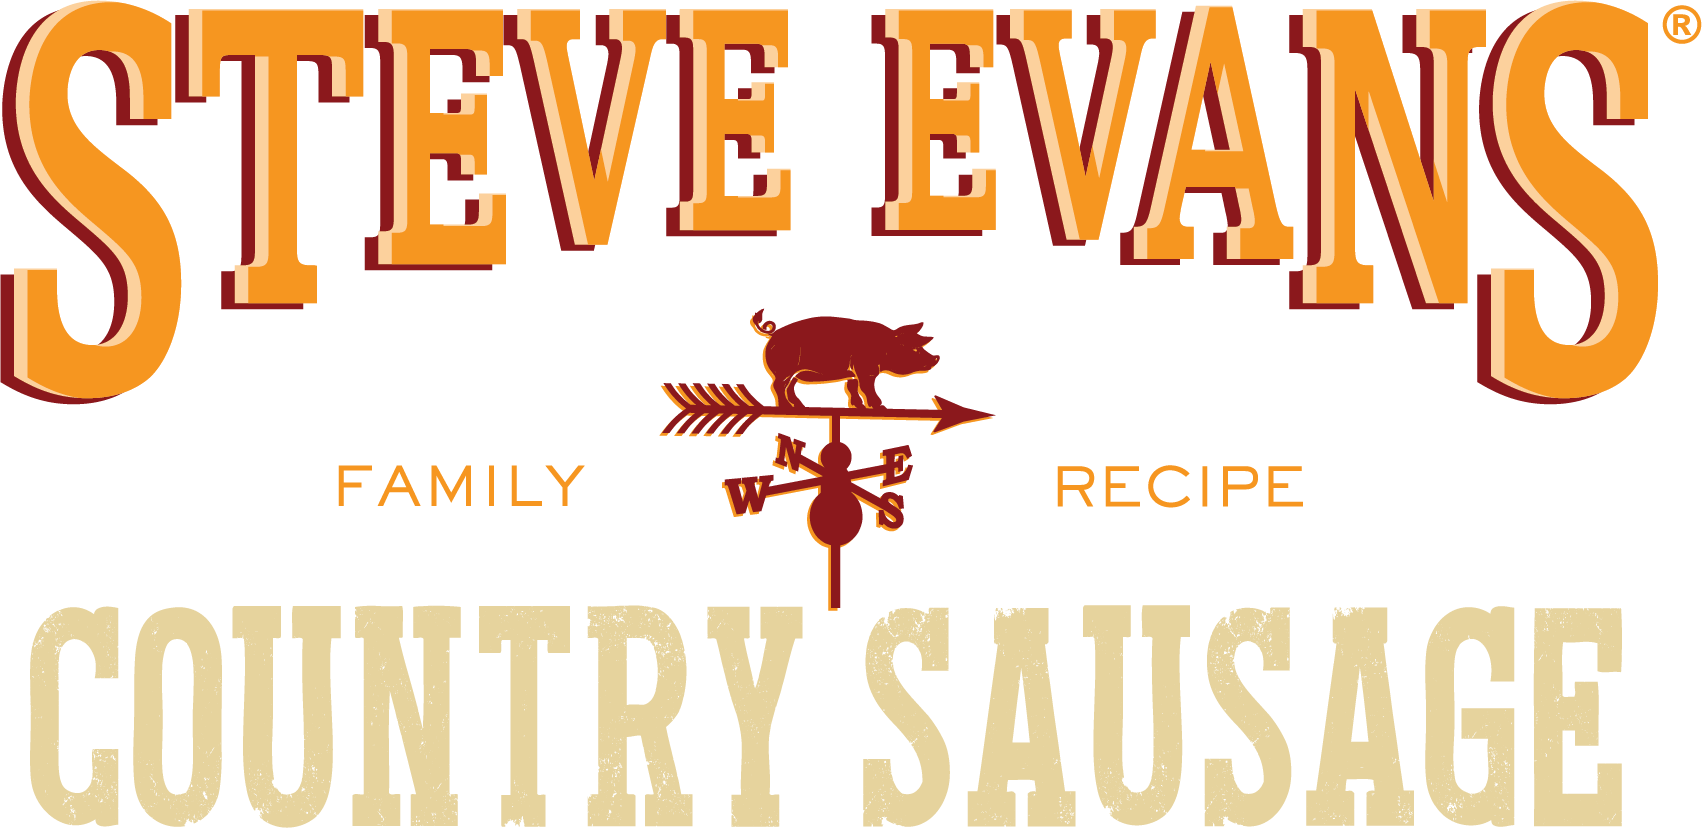 Steve Evans Sausage